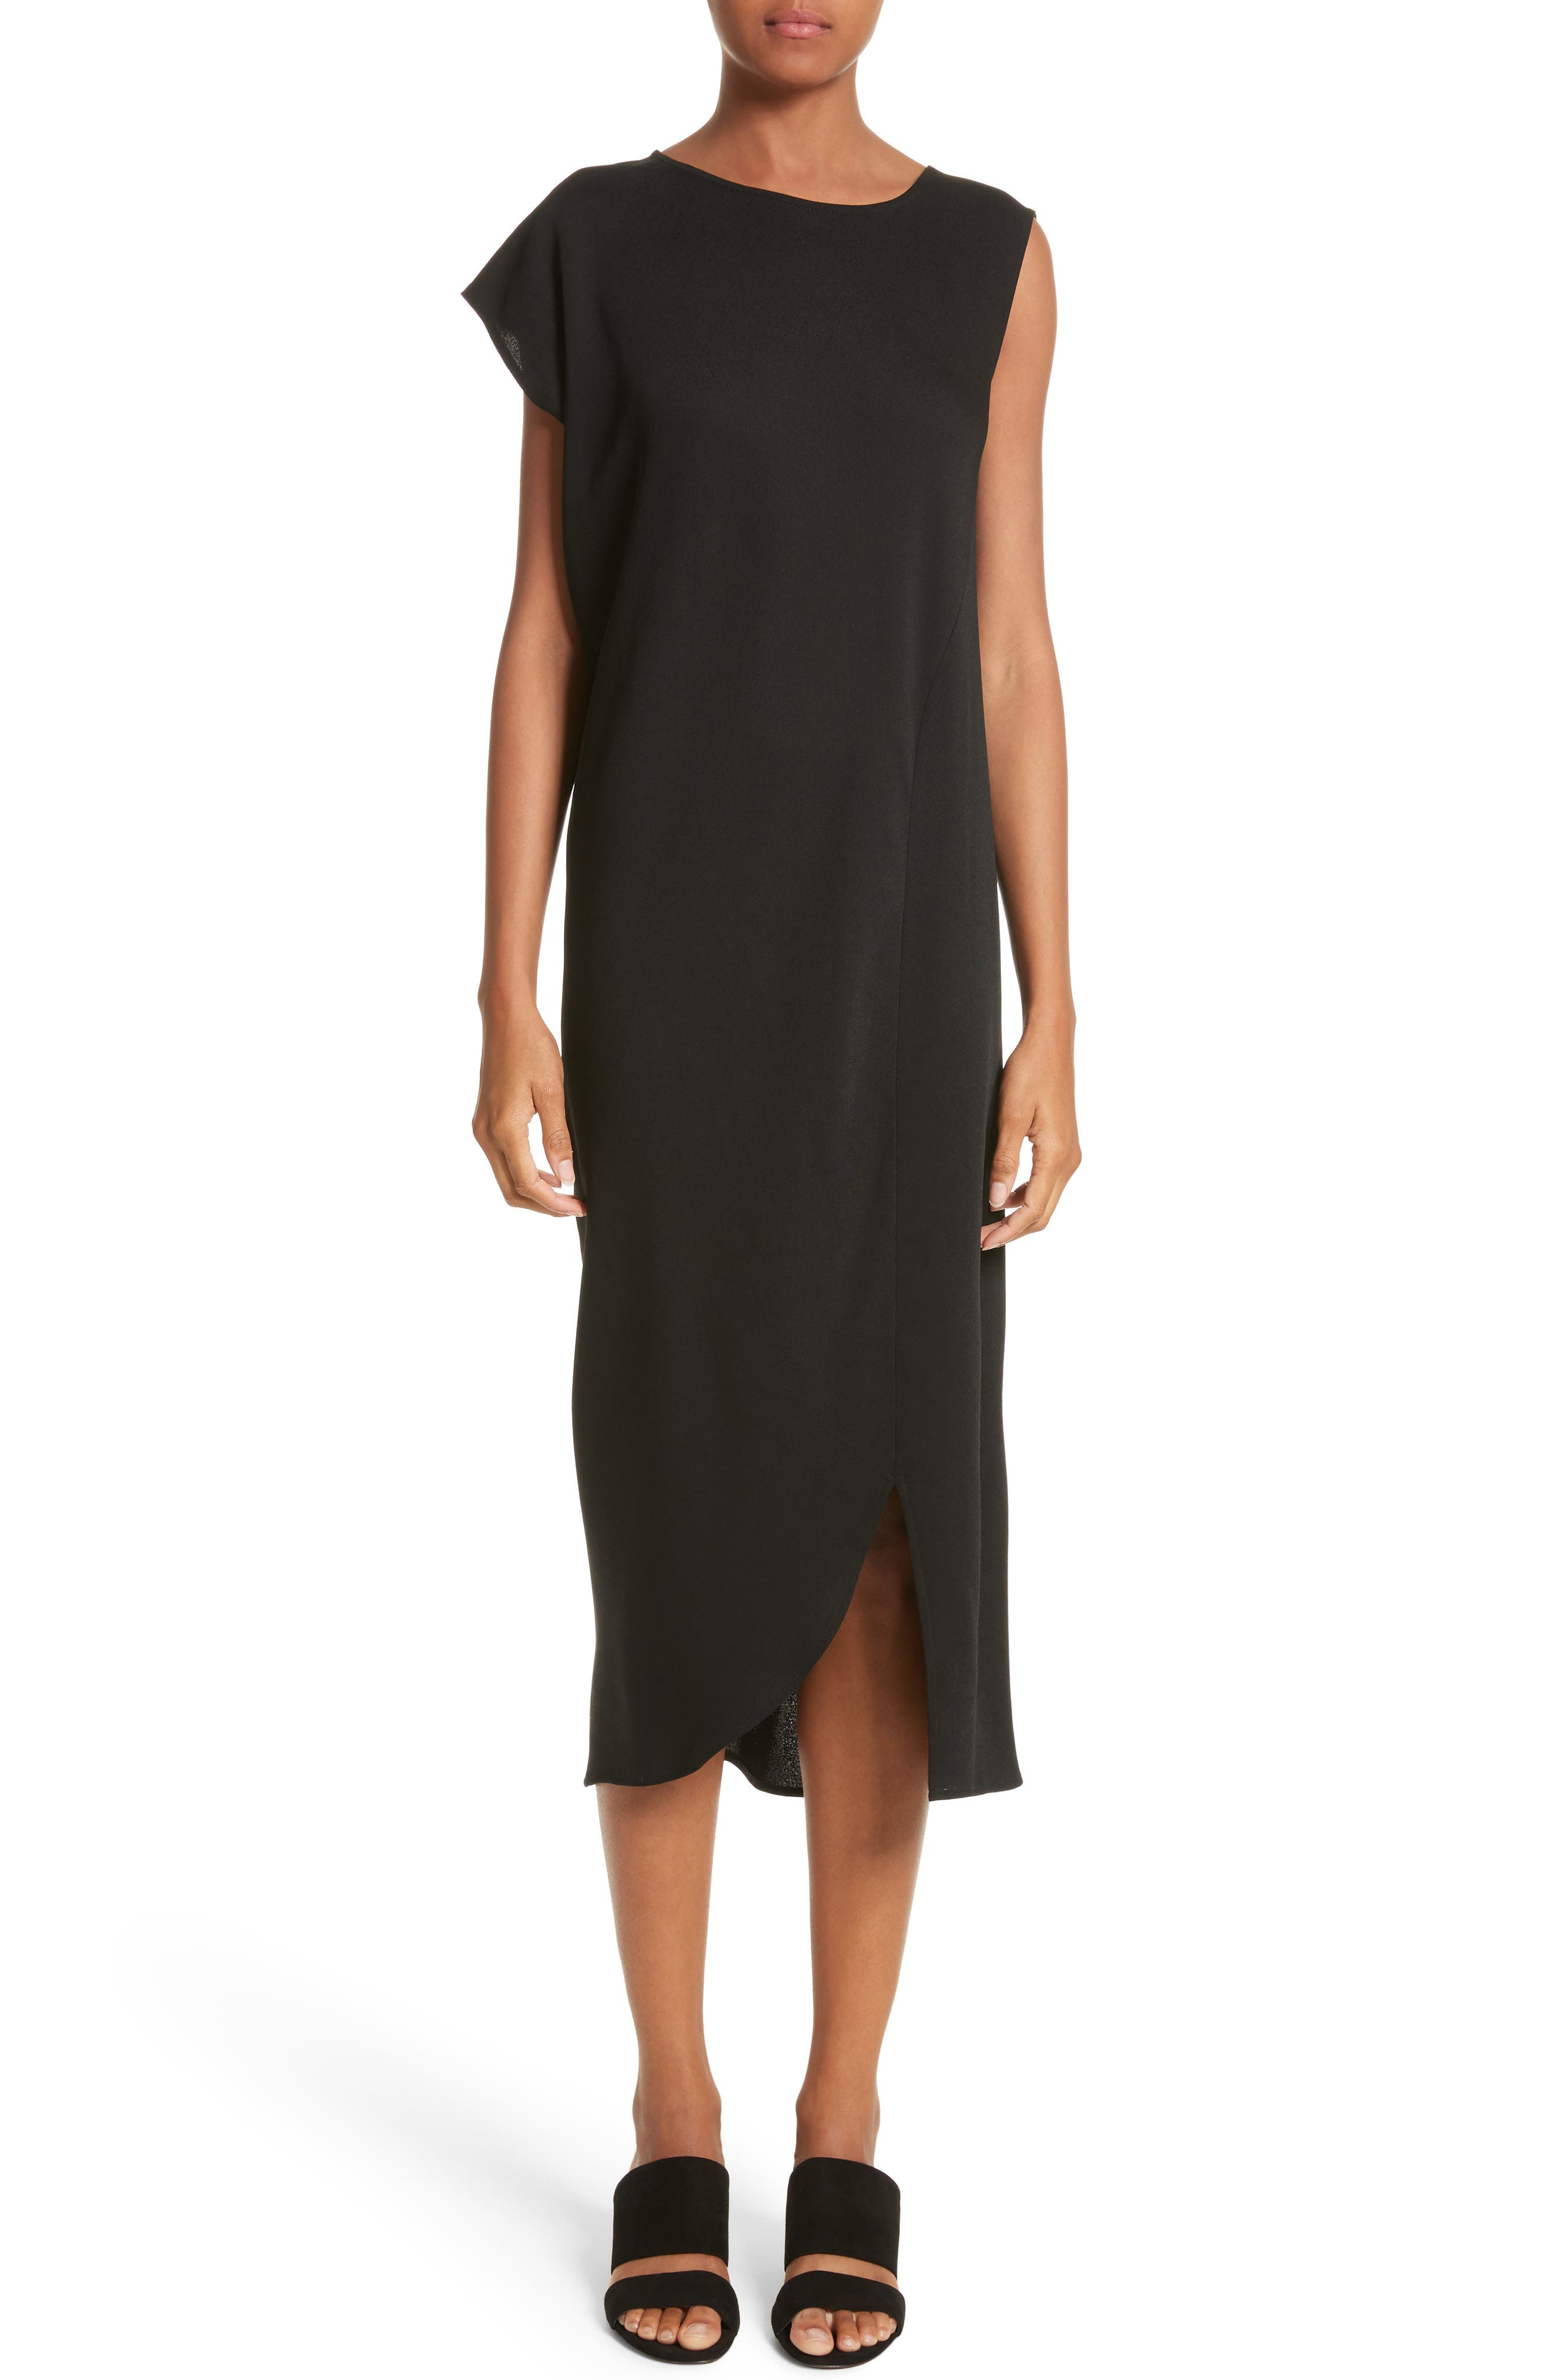 Zero + Maria Cornejo Tula Eco Drape Dress